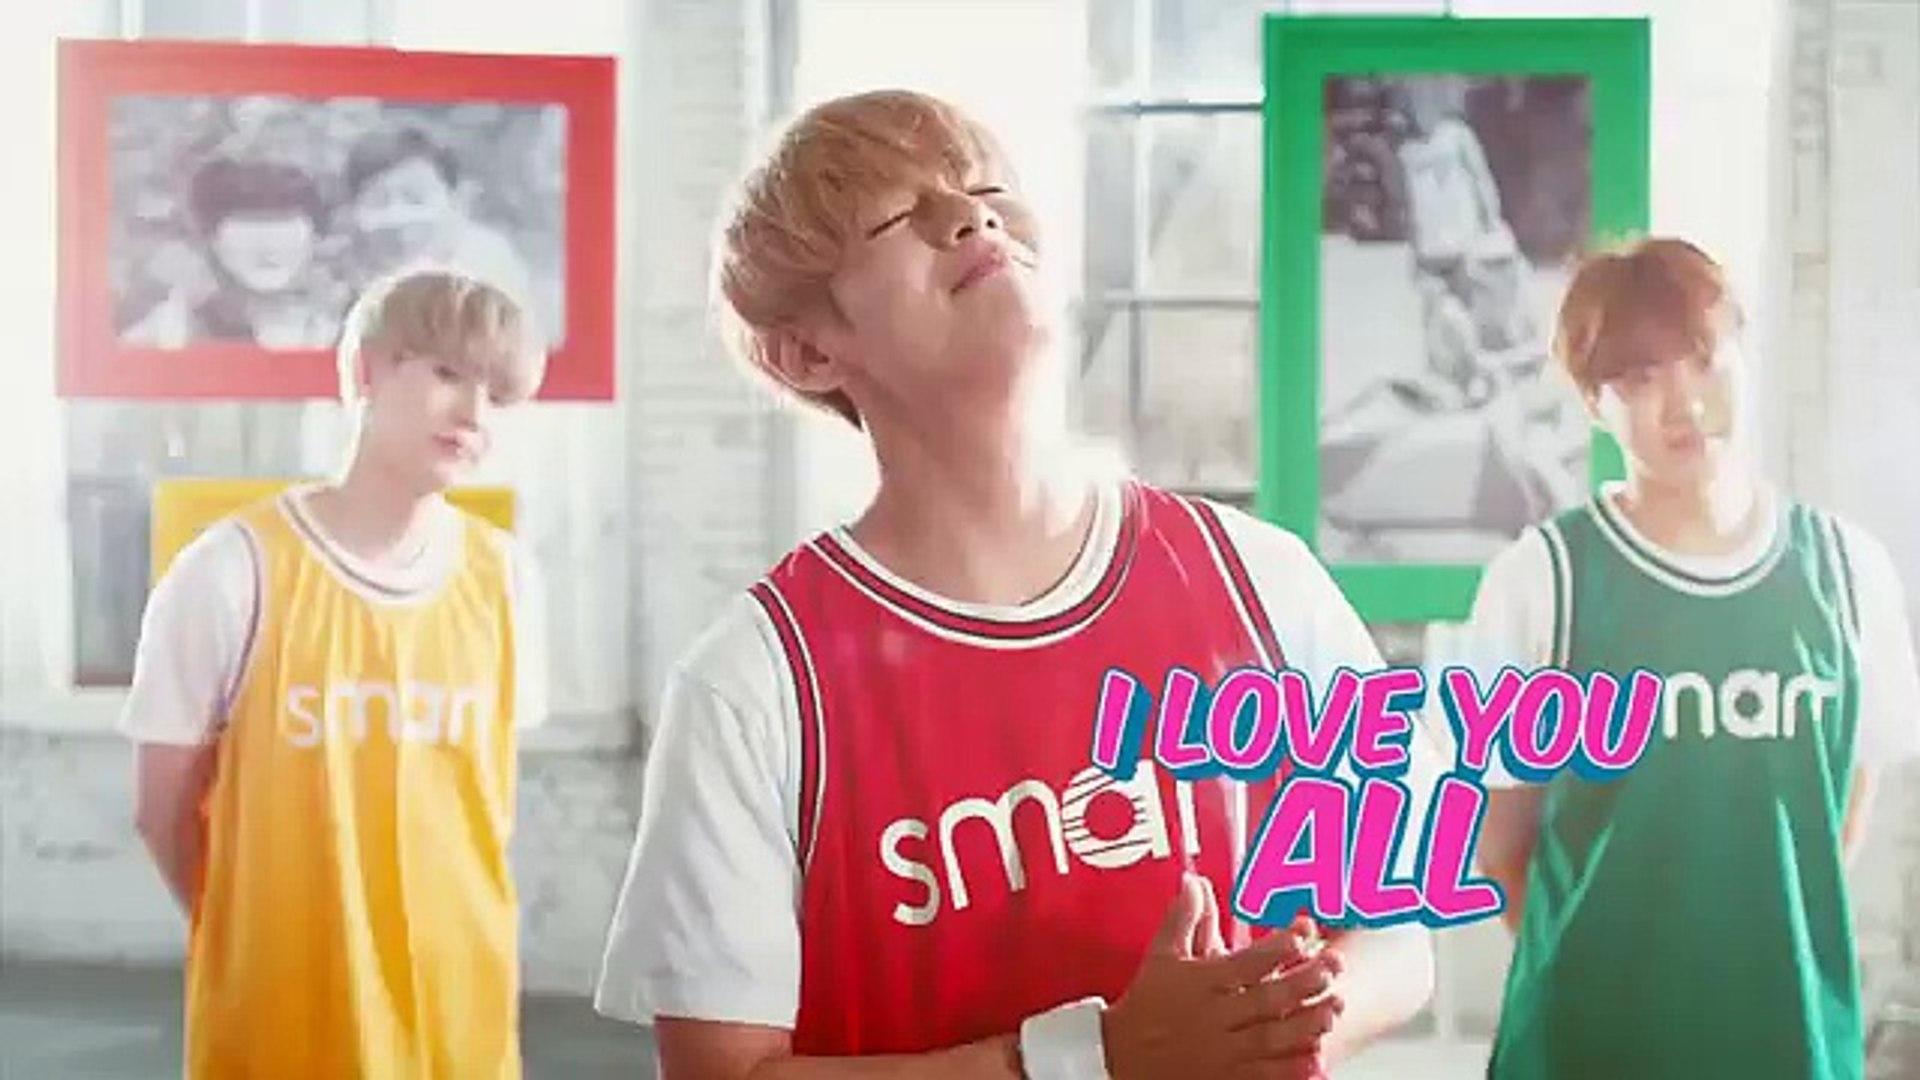 BTS X GFRIEND Family song MV smart school uniform